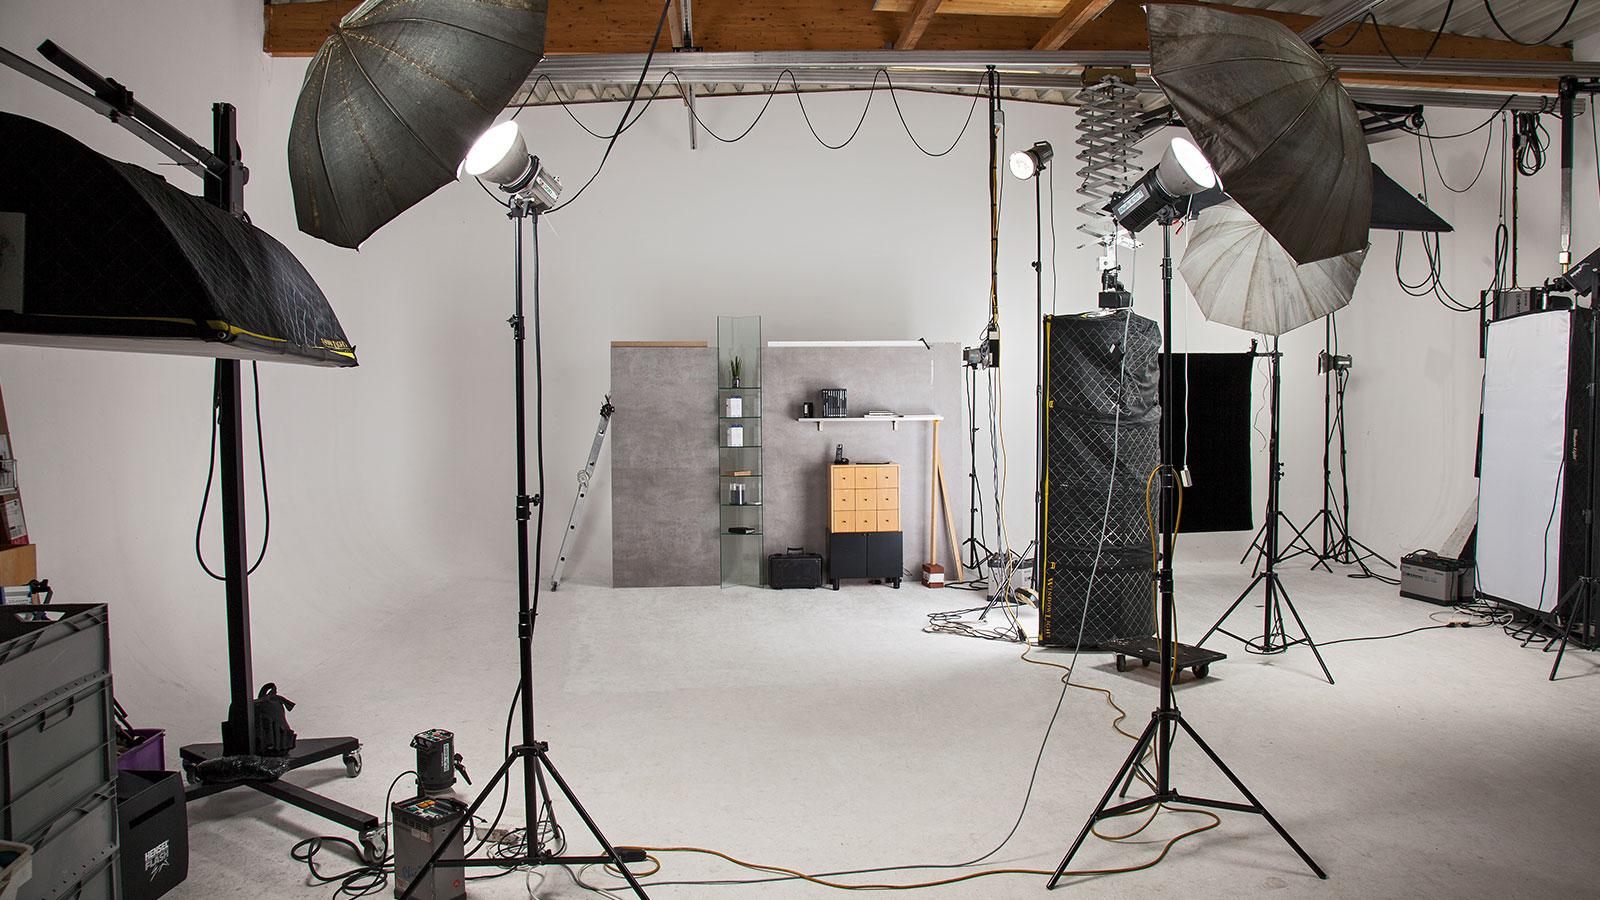 einfacher Aufbau im Fotostudio